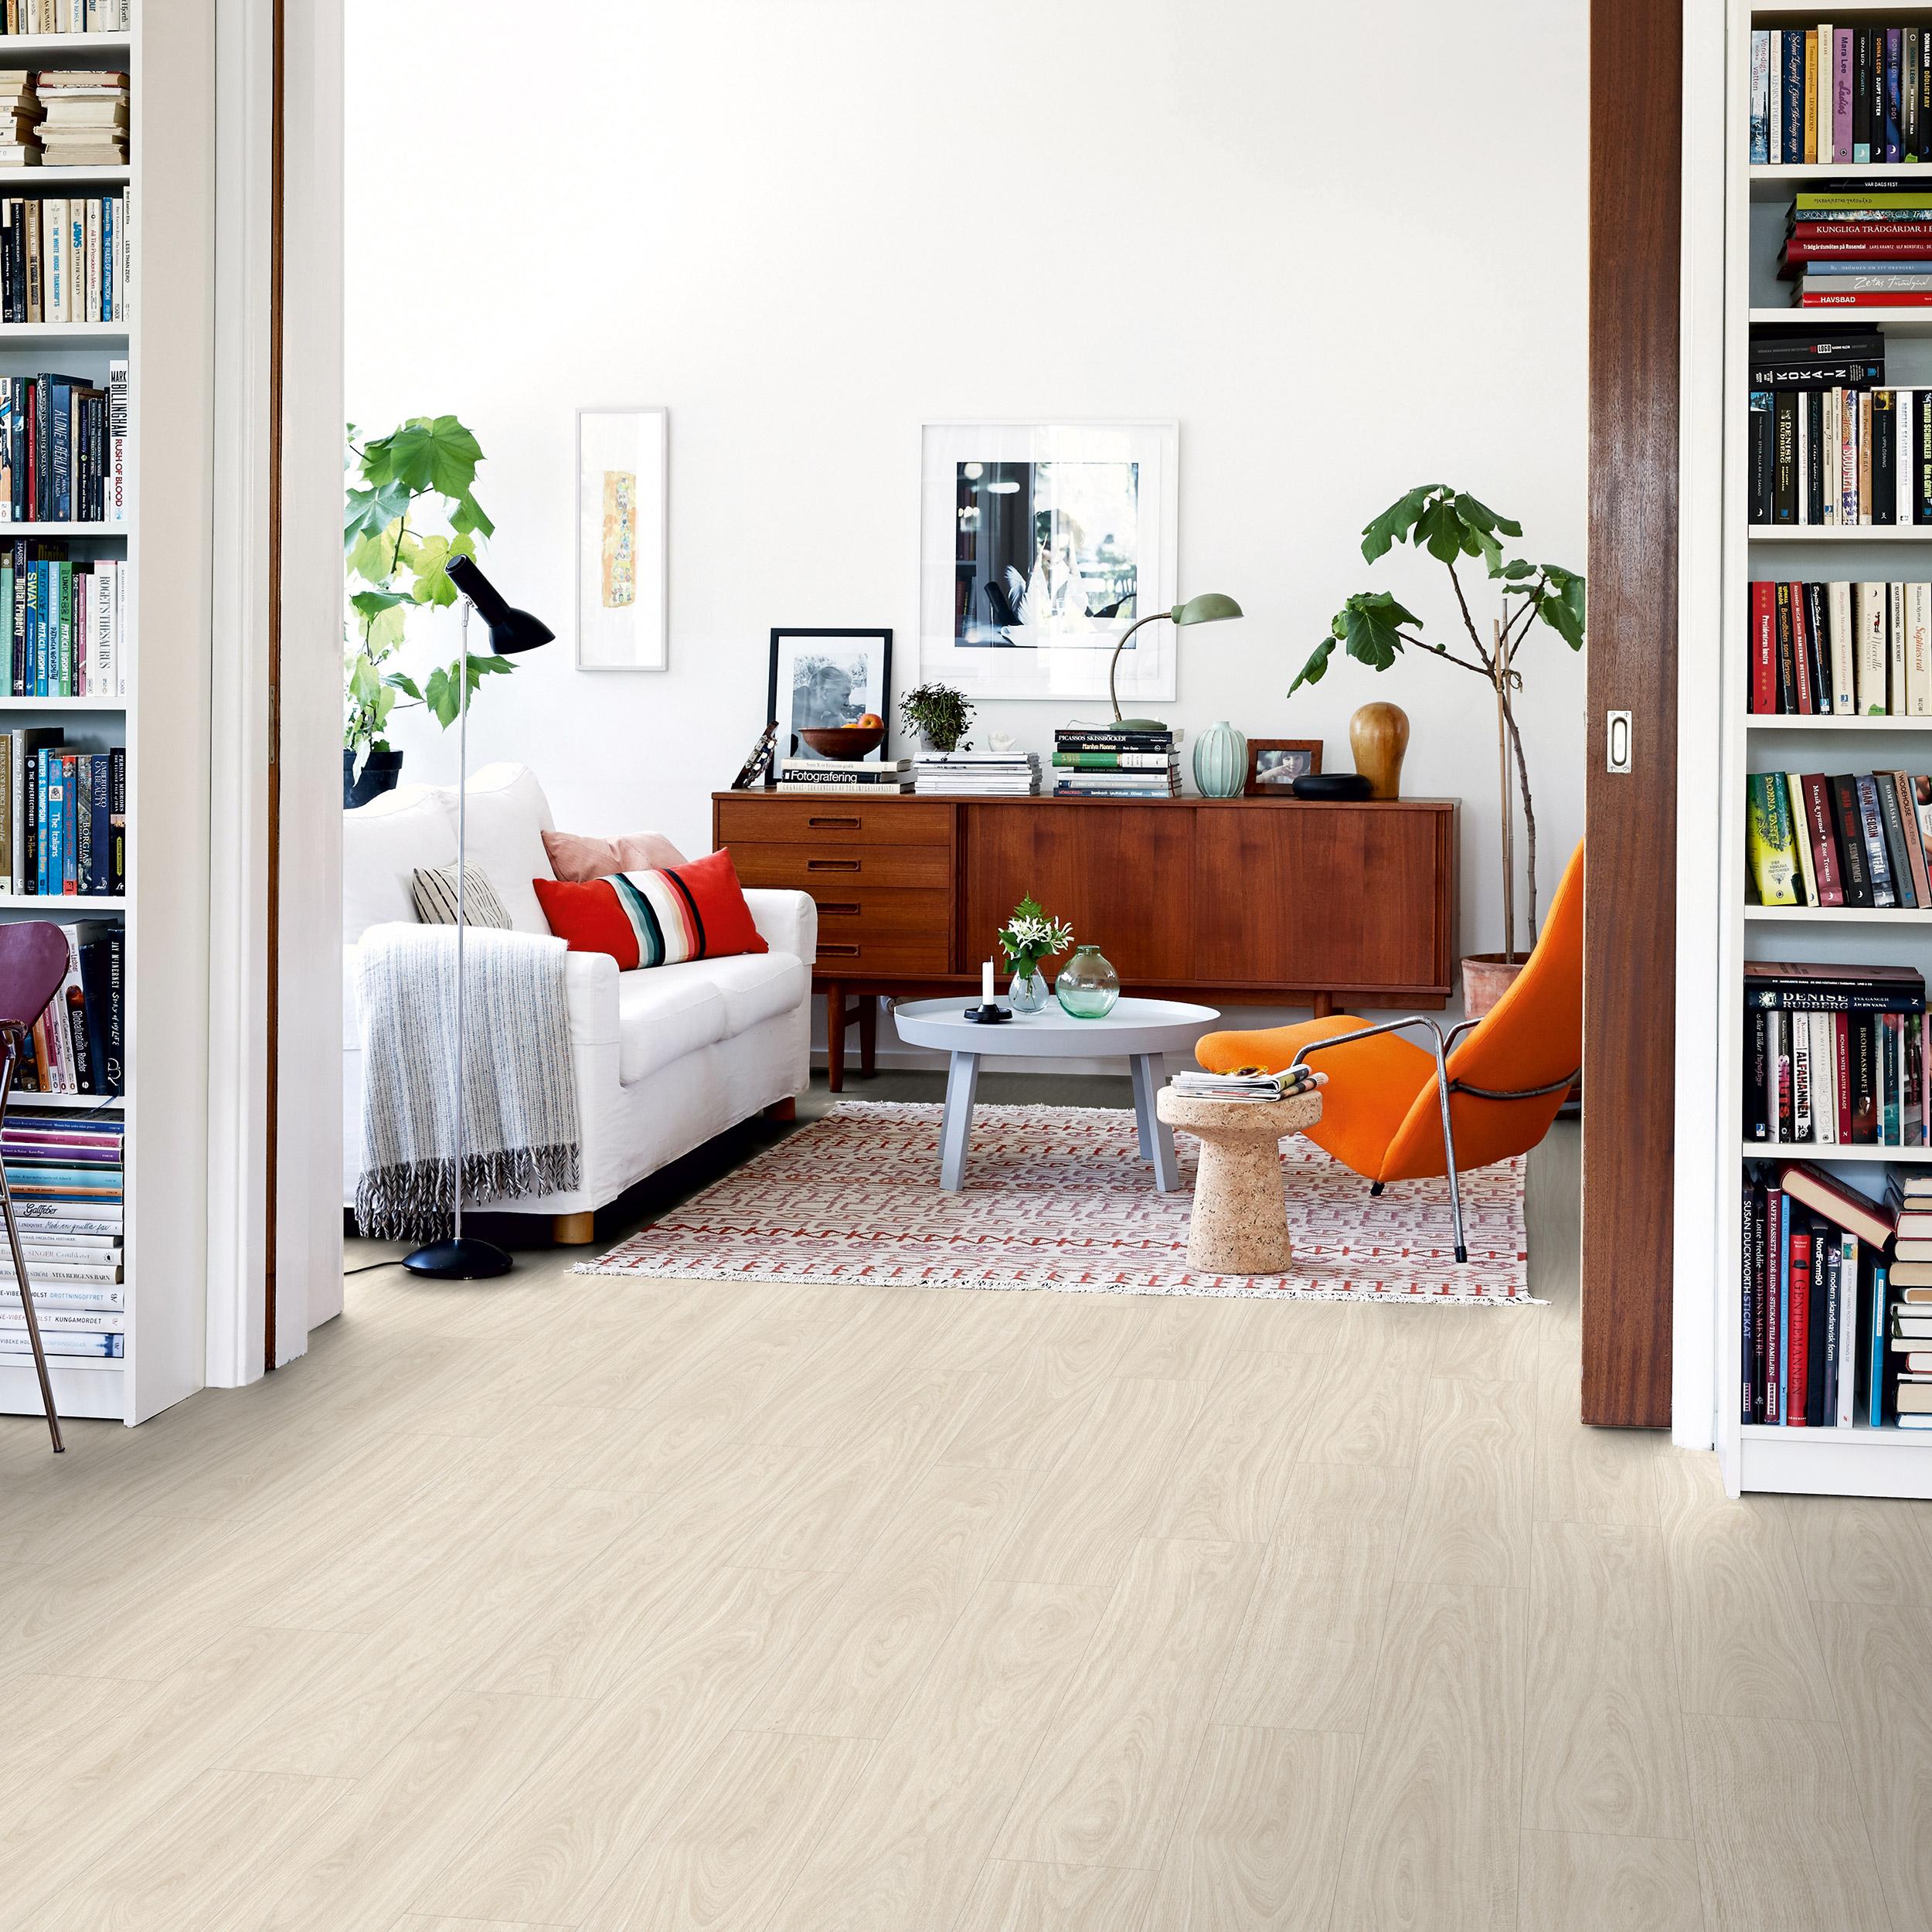 Vinylgolv Pergo Rigid Click Classic Plank Nordic White Oak